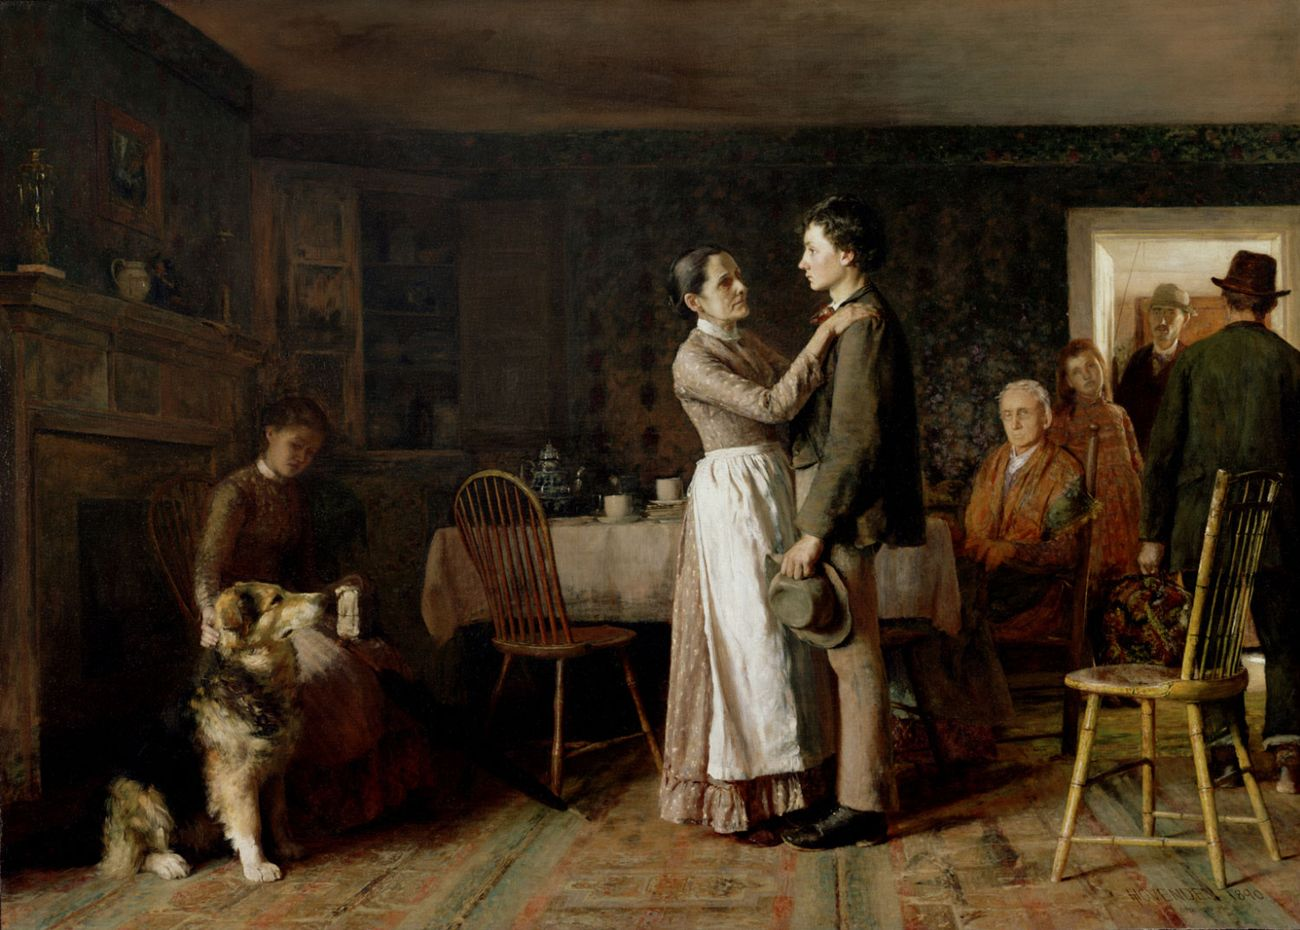 Thomas Hovenden, Breaking Home Ties, 1895. Philadelphia Museum of Art